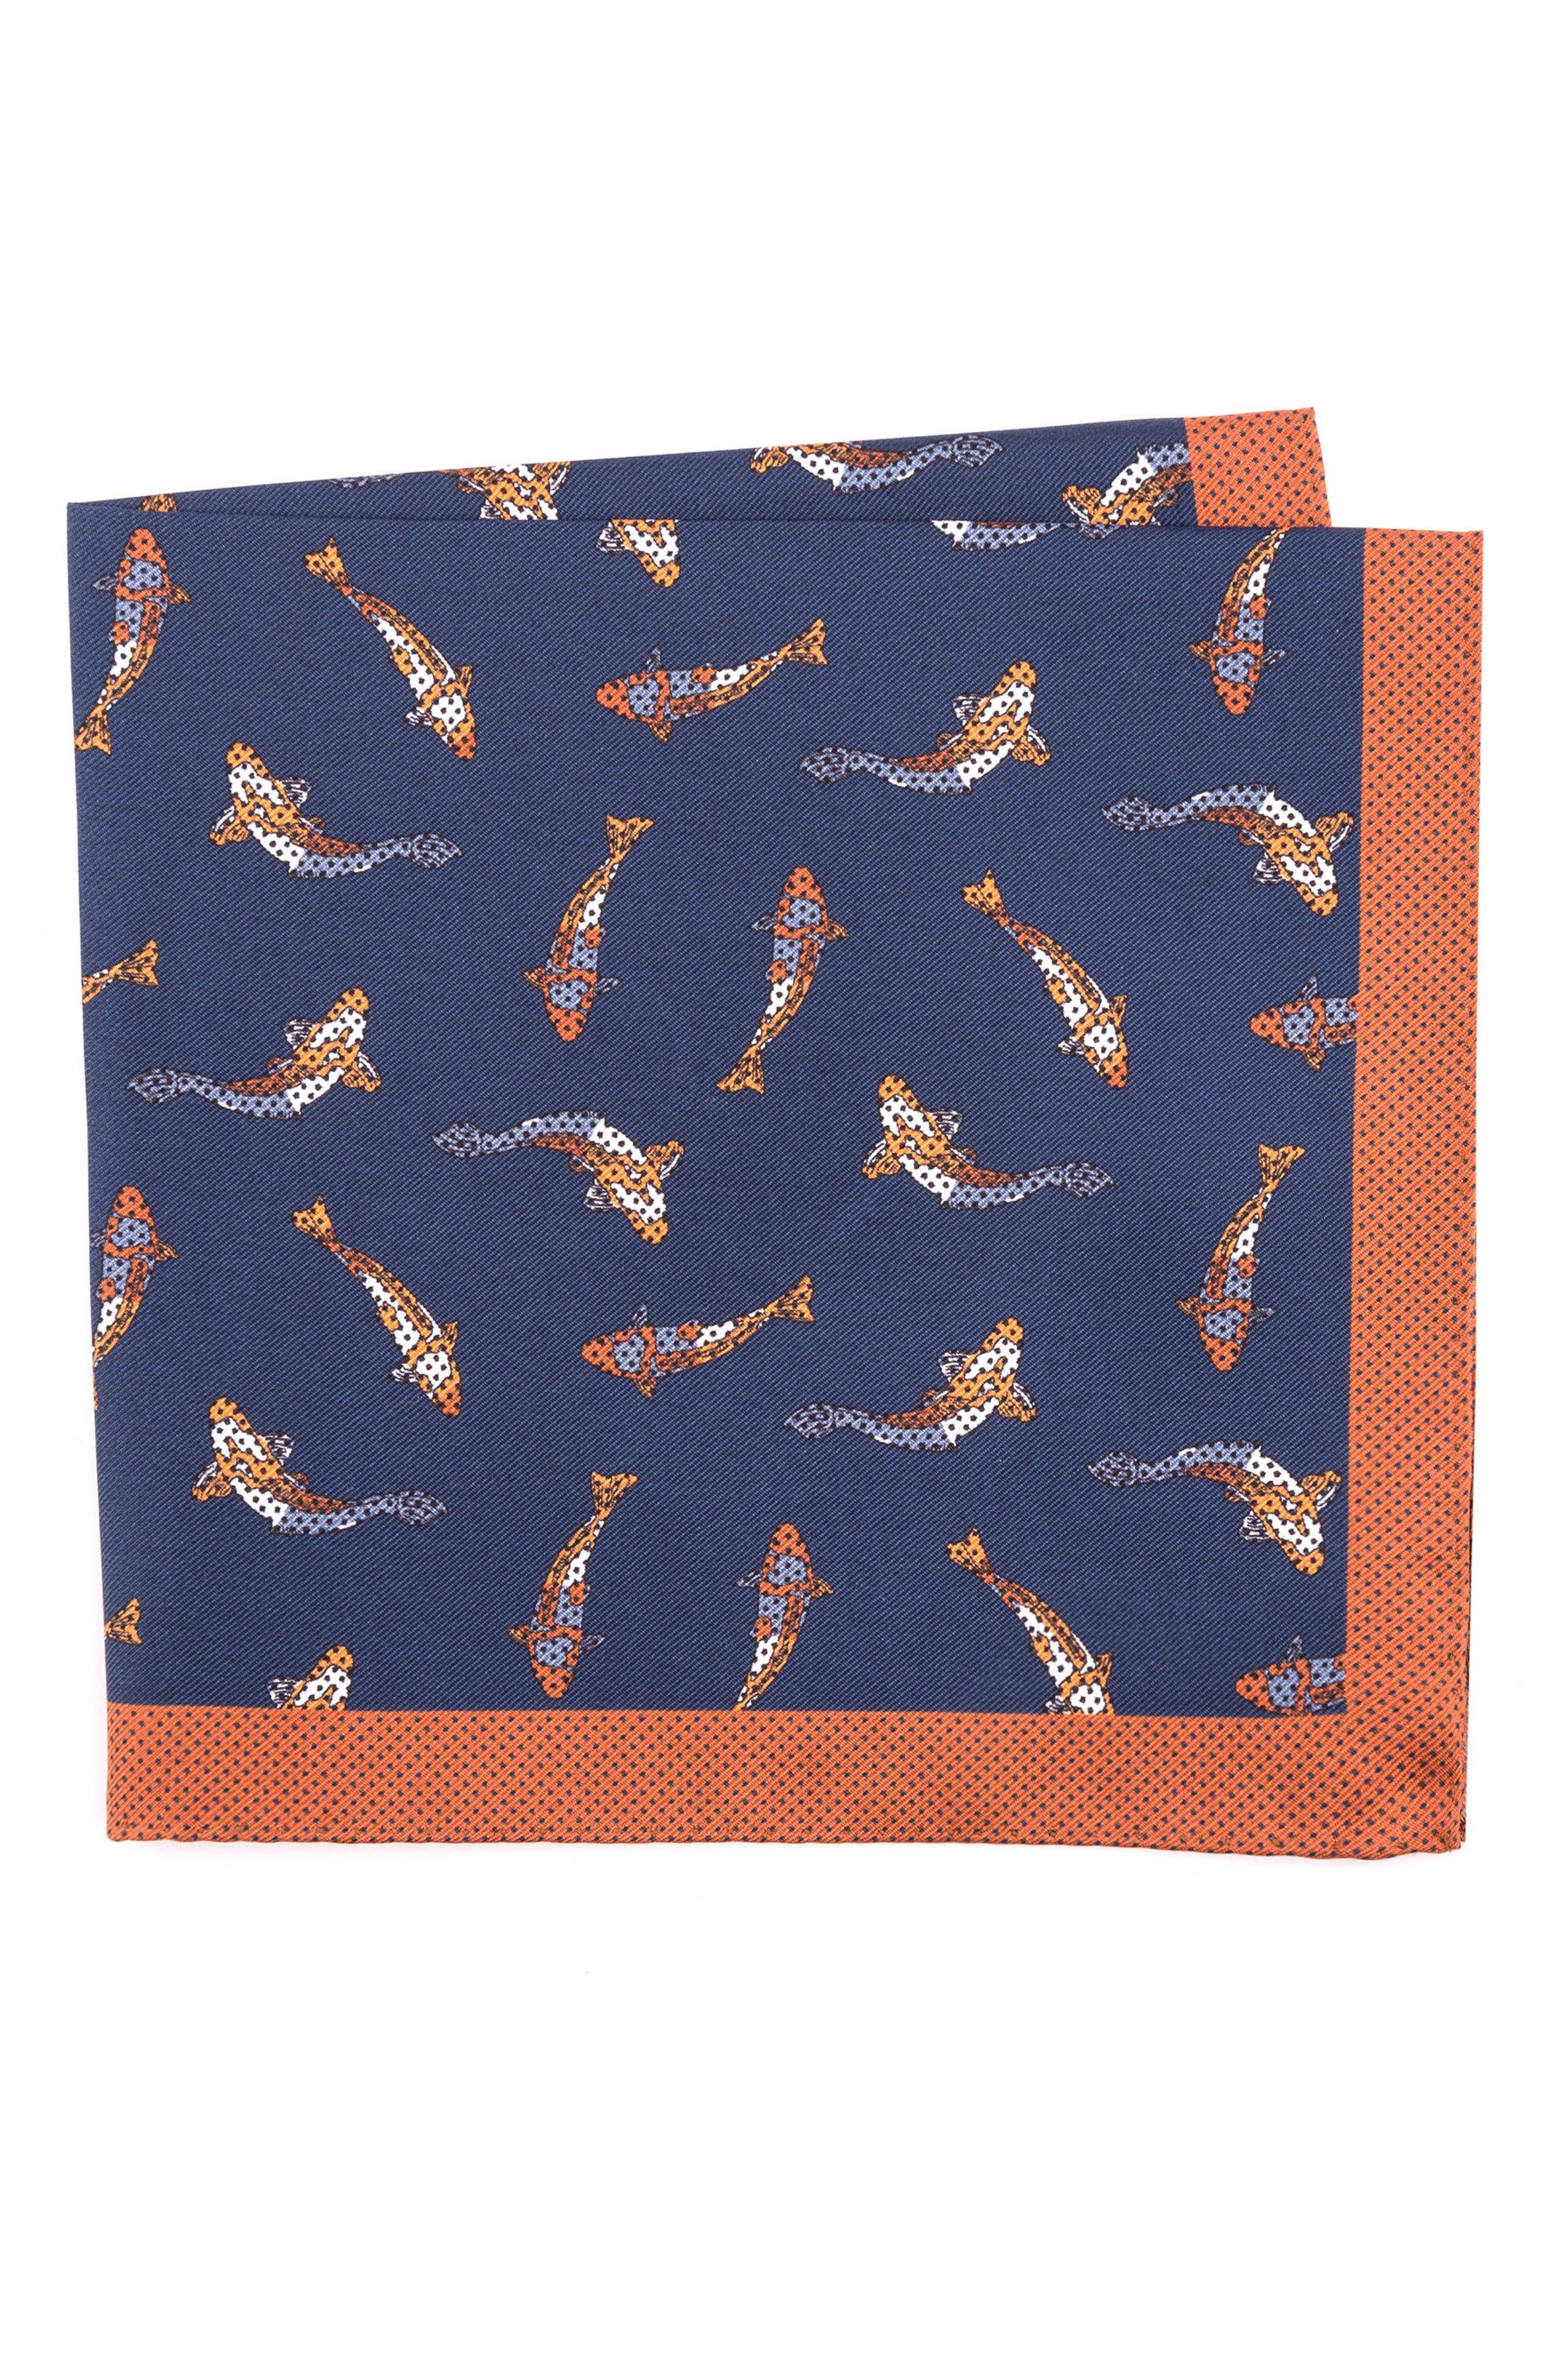 Koi Fish Silk Pocket Square,                             Main thumbnail 3, color,